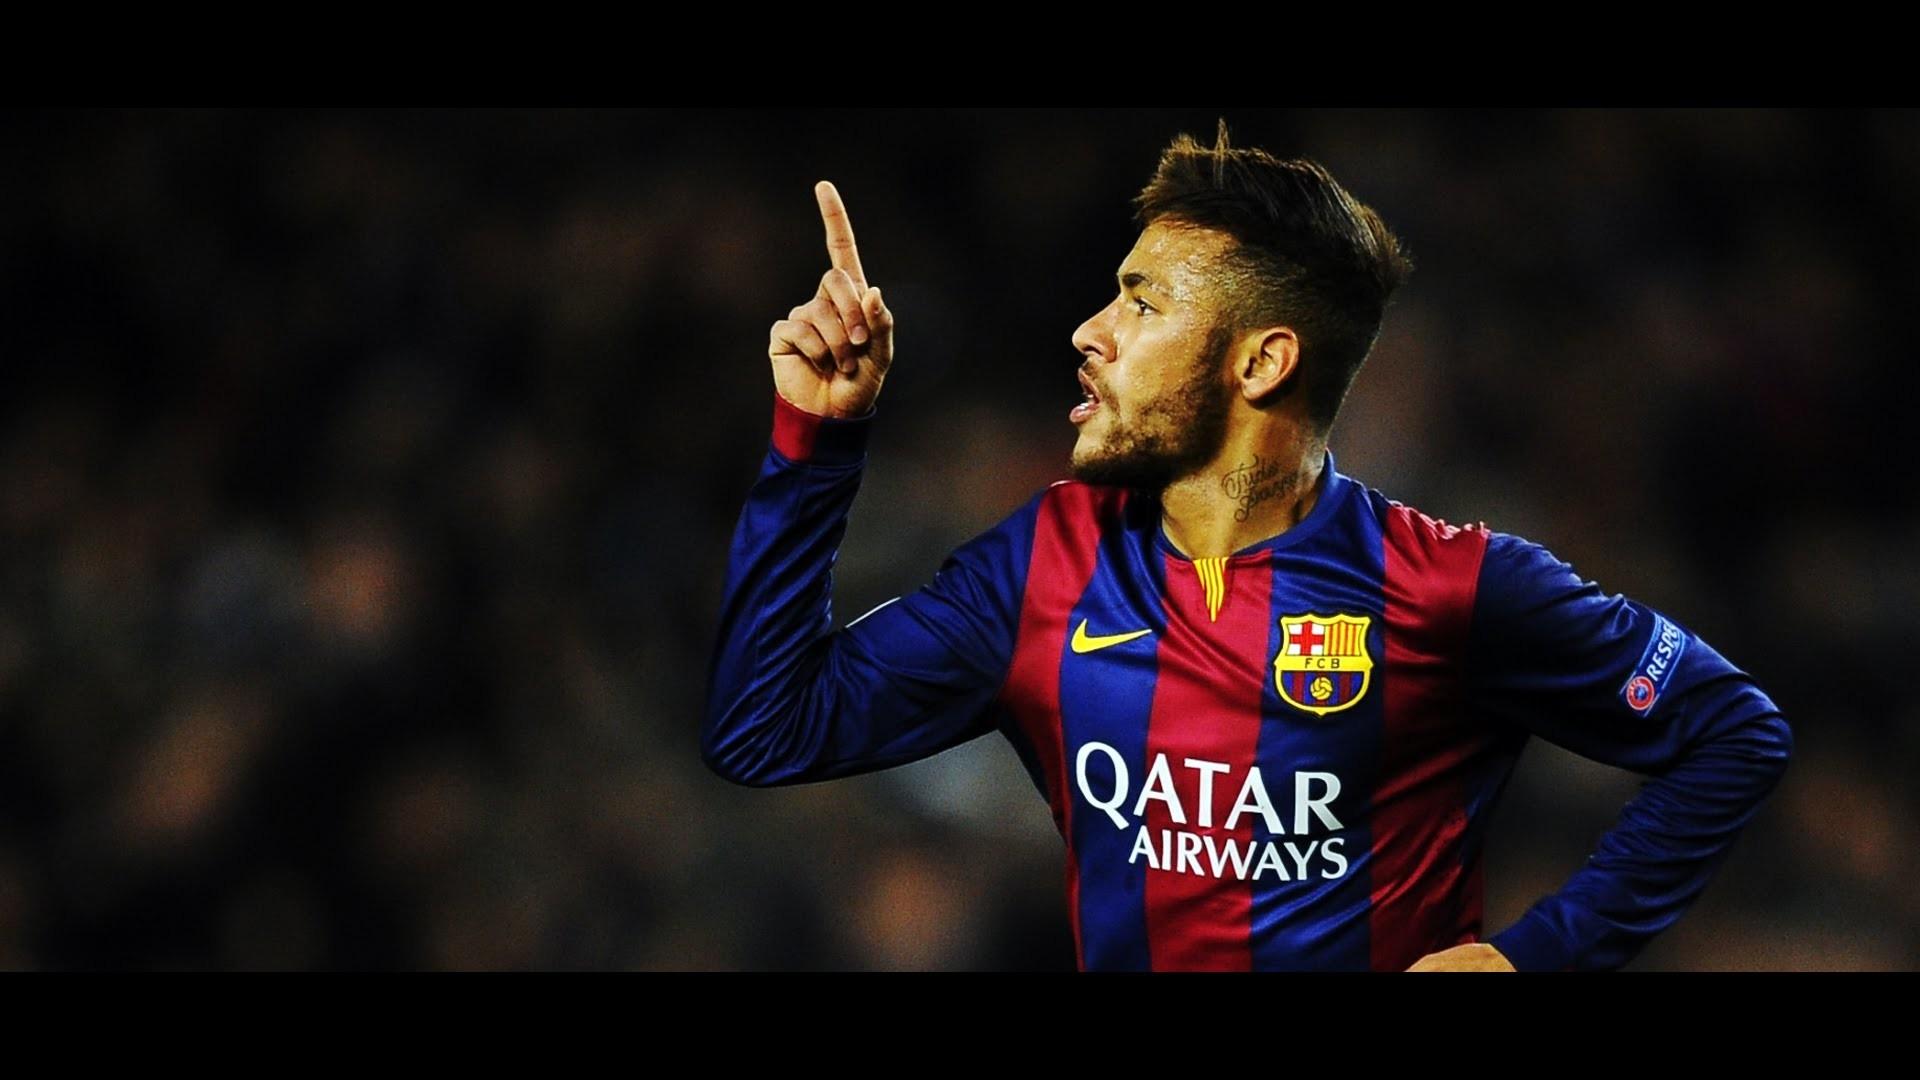 Hd Images Of Neymar: Neymar HD Wallpaper 2018 (79+ Images